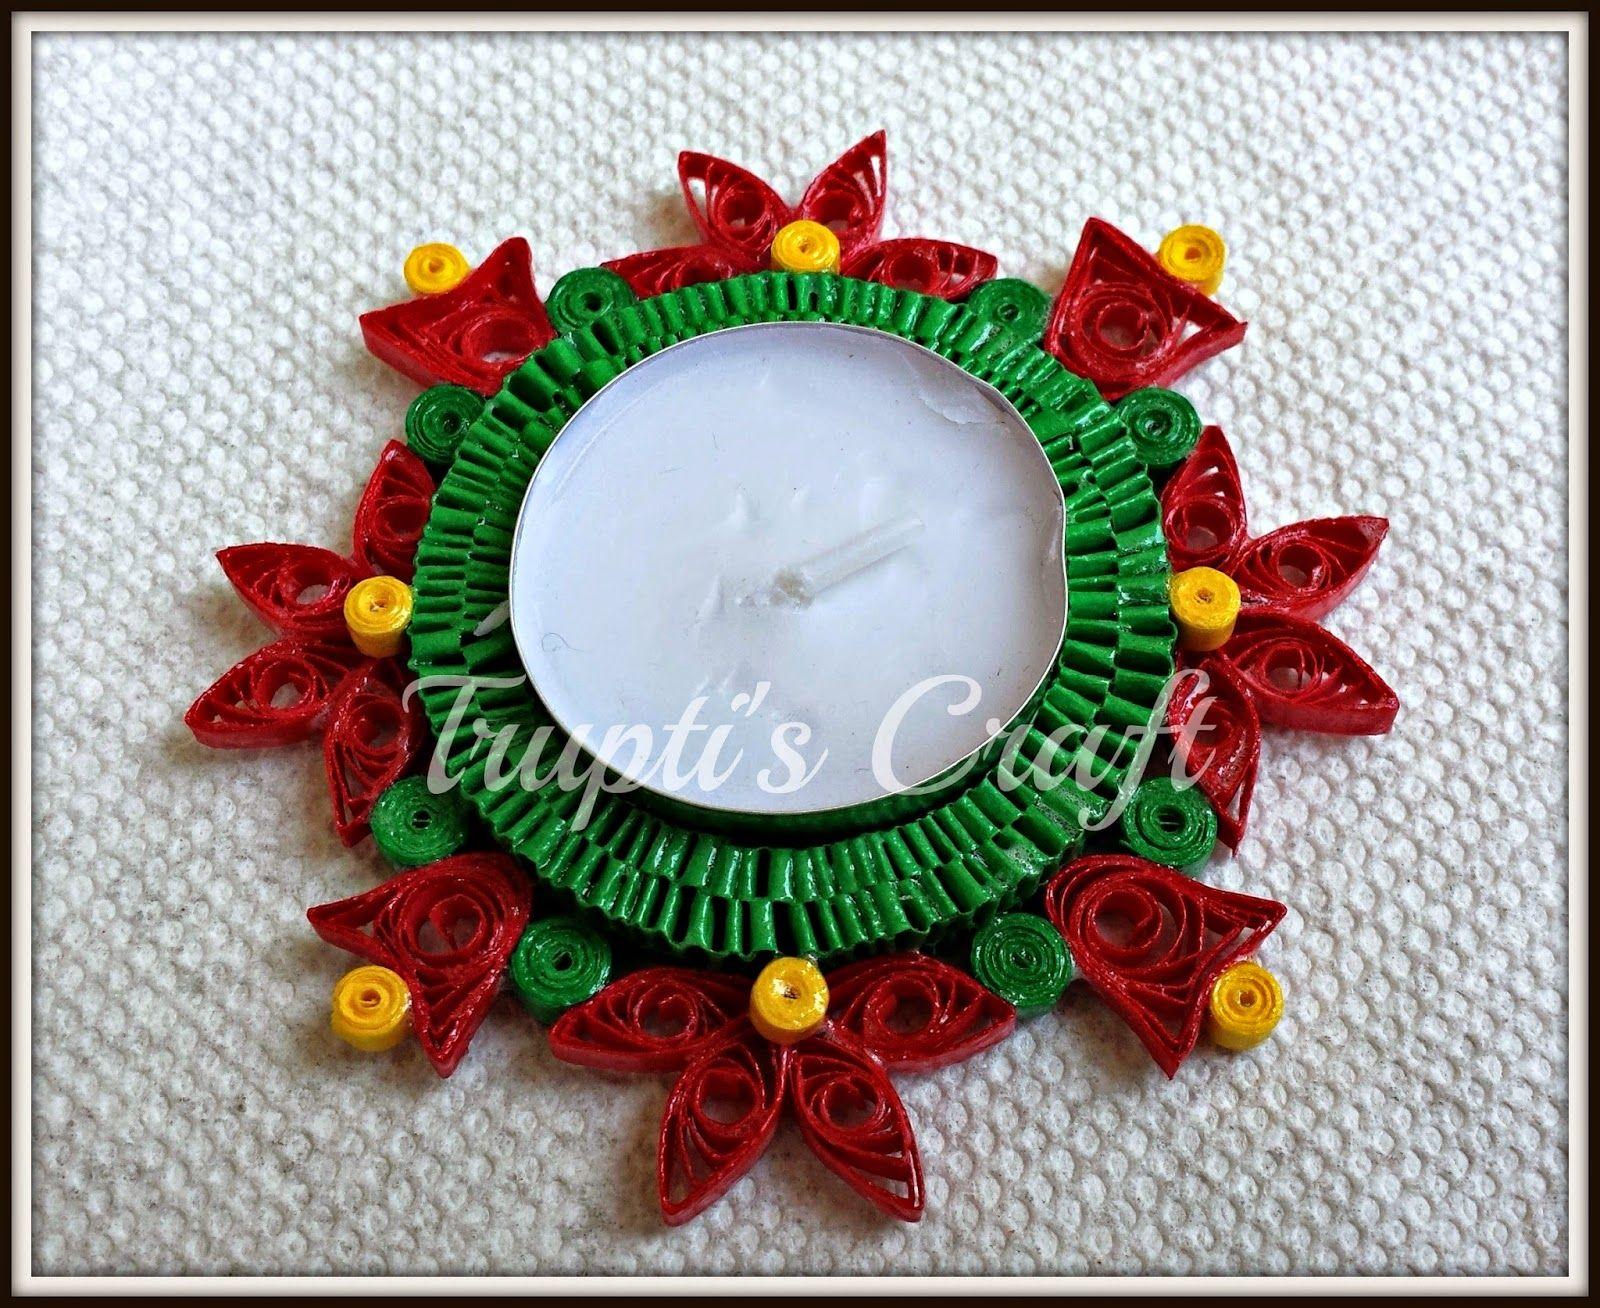 Trupti's Craft: Christmas Candle Holder cum Ornament ... - photo#22